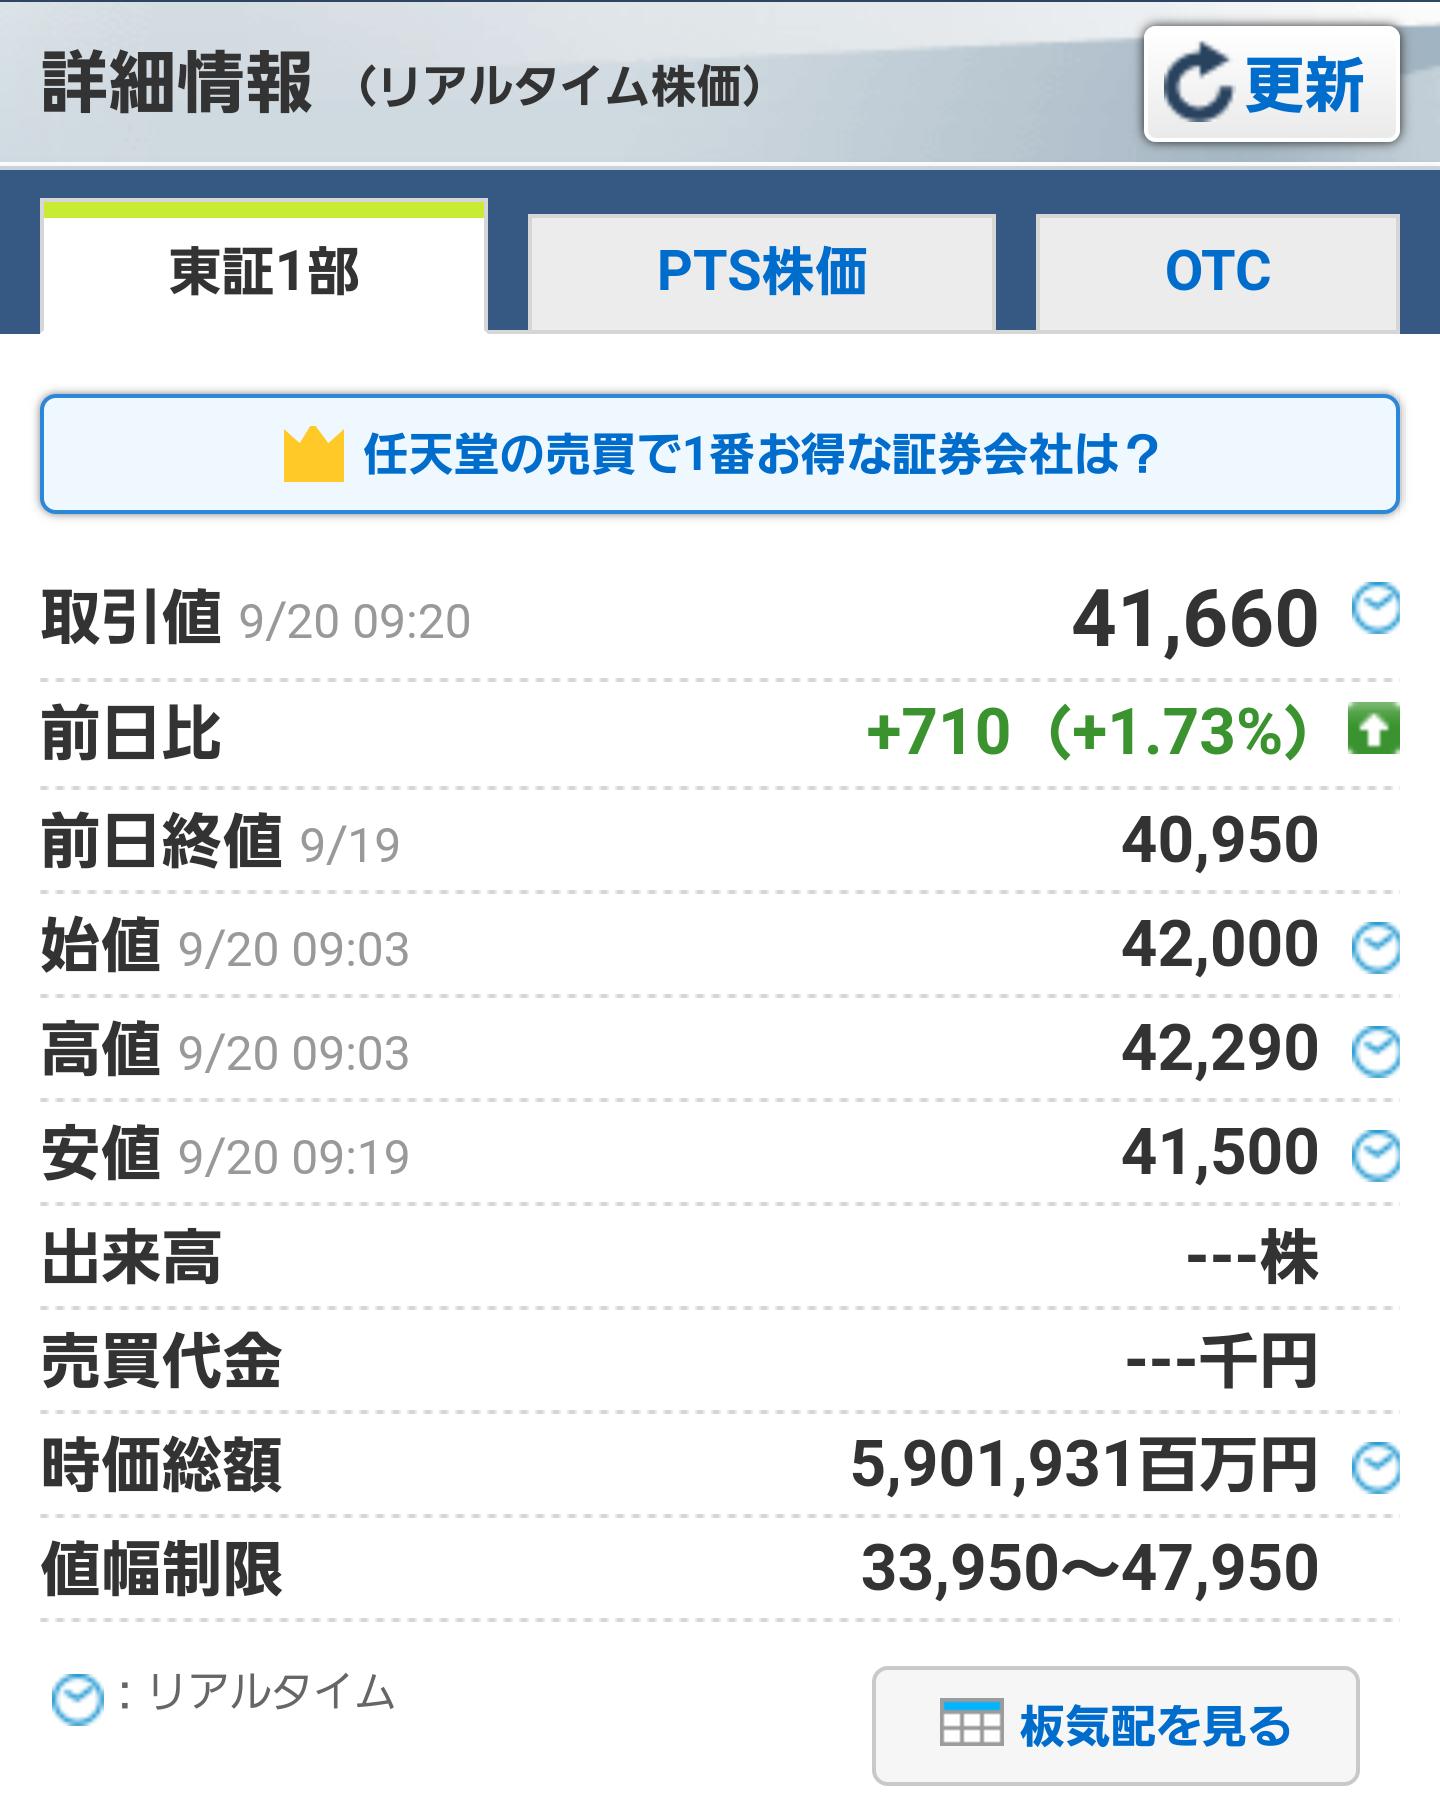 vsE0UC3EHdI3K - 【速報】任天堂が9年ぶりに4万円台を回復、レーティングと目標株価引き上げ